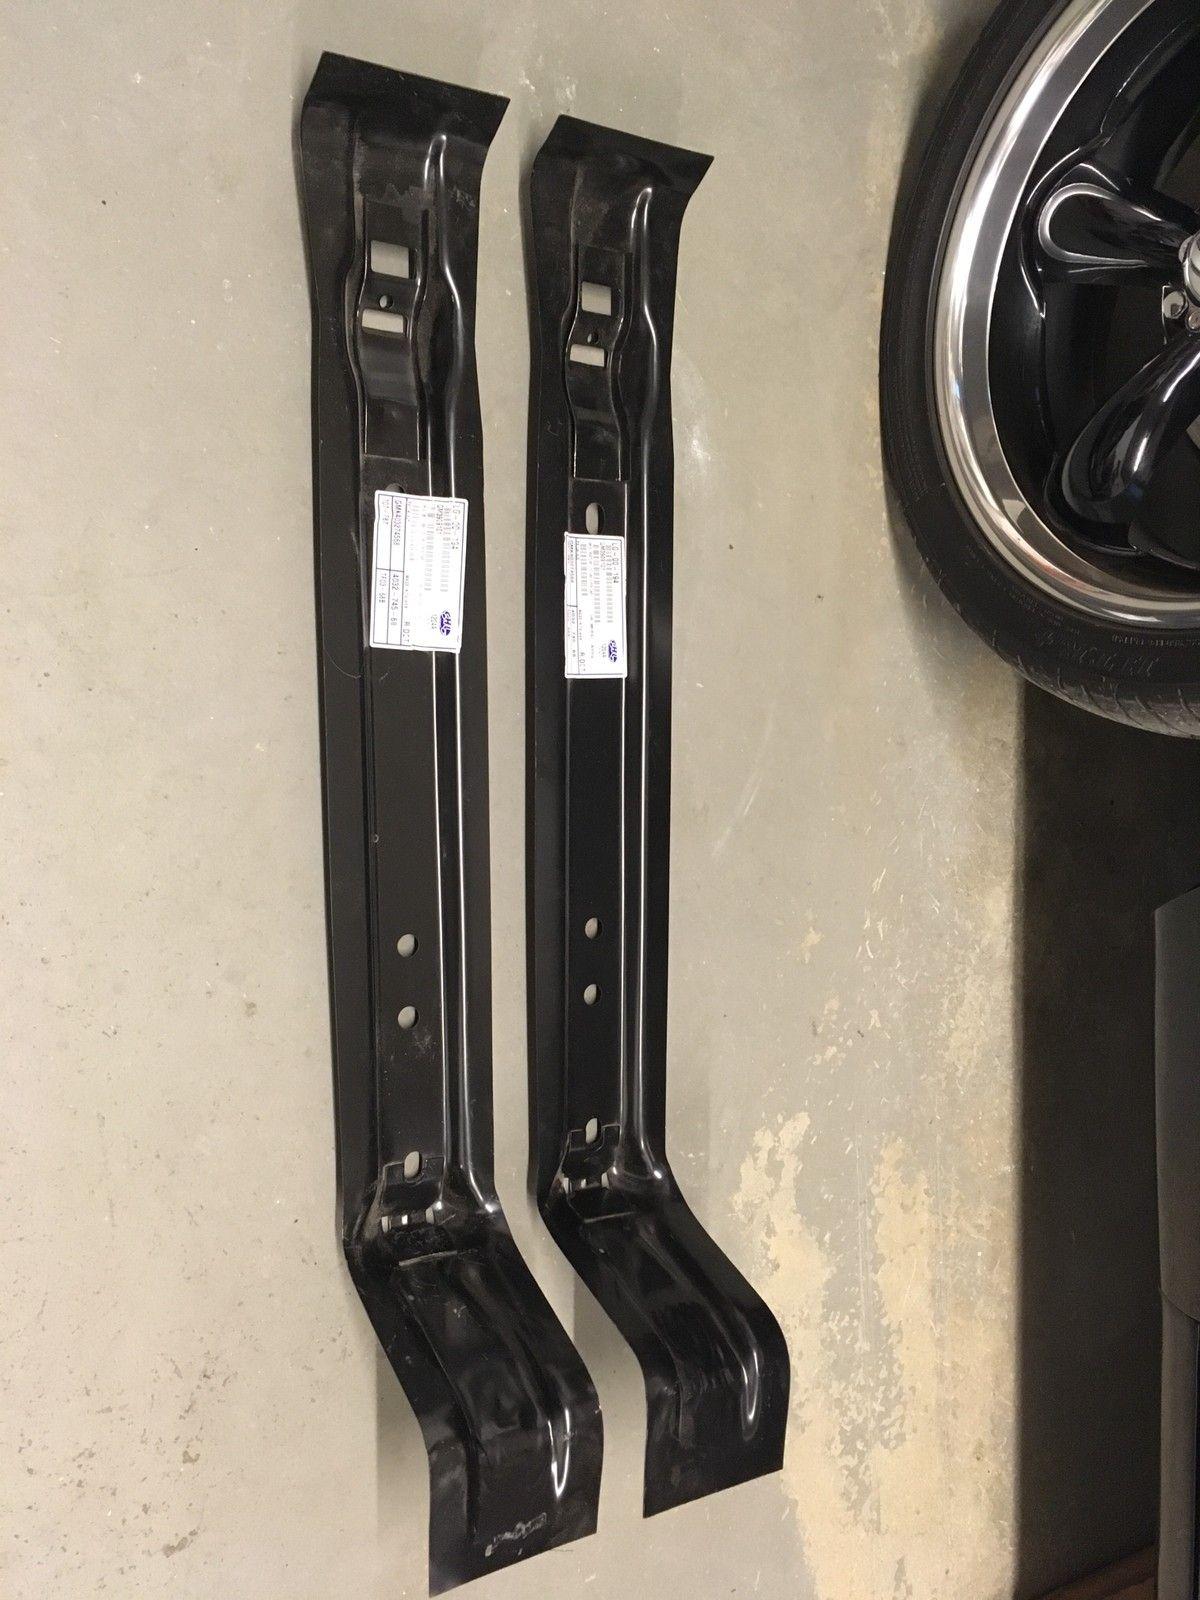 Braketter bensintank GM A-body 68-72 - Støren  - Braketter for bensintank GM A-body 68-72. Utpakket, ubrukt. GM3909101      Søkeord: GM, Chevrolet, Pontiac, Chevelle, Malibu, LeMans, GTO, Tempest, Monte Carlo - Støren